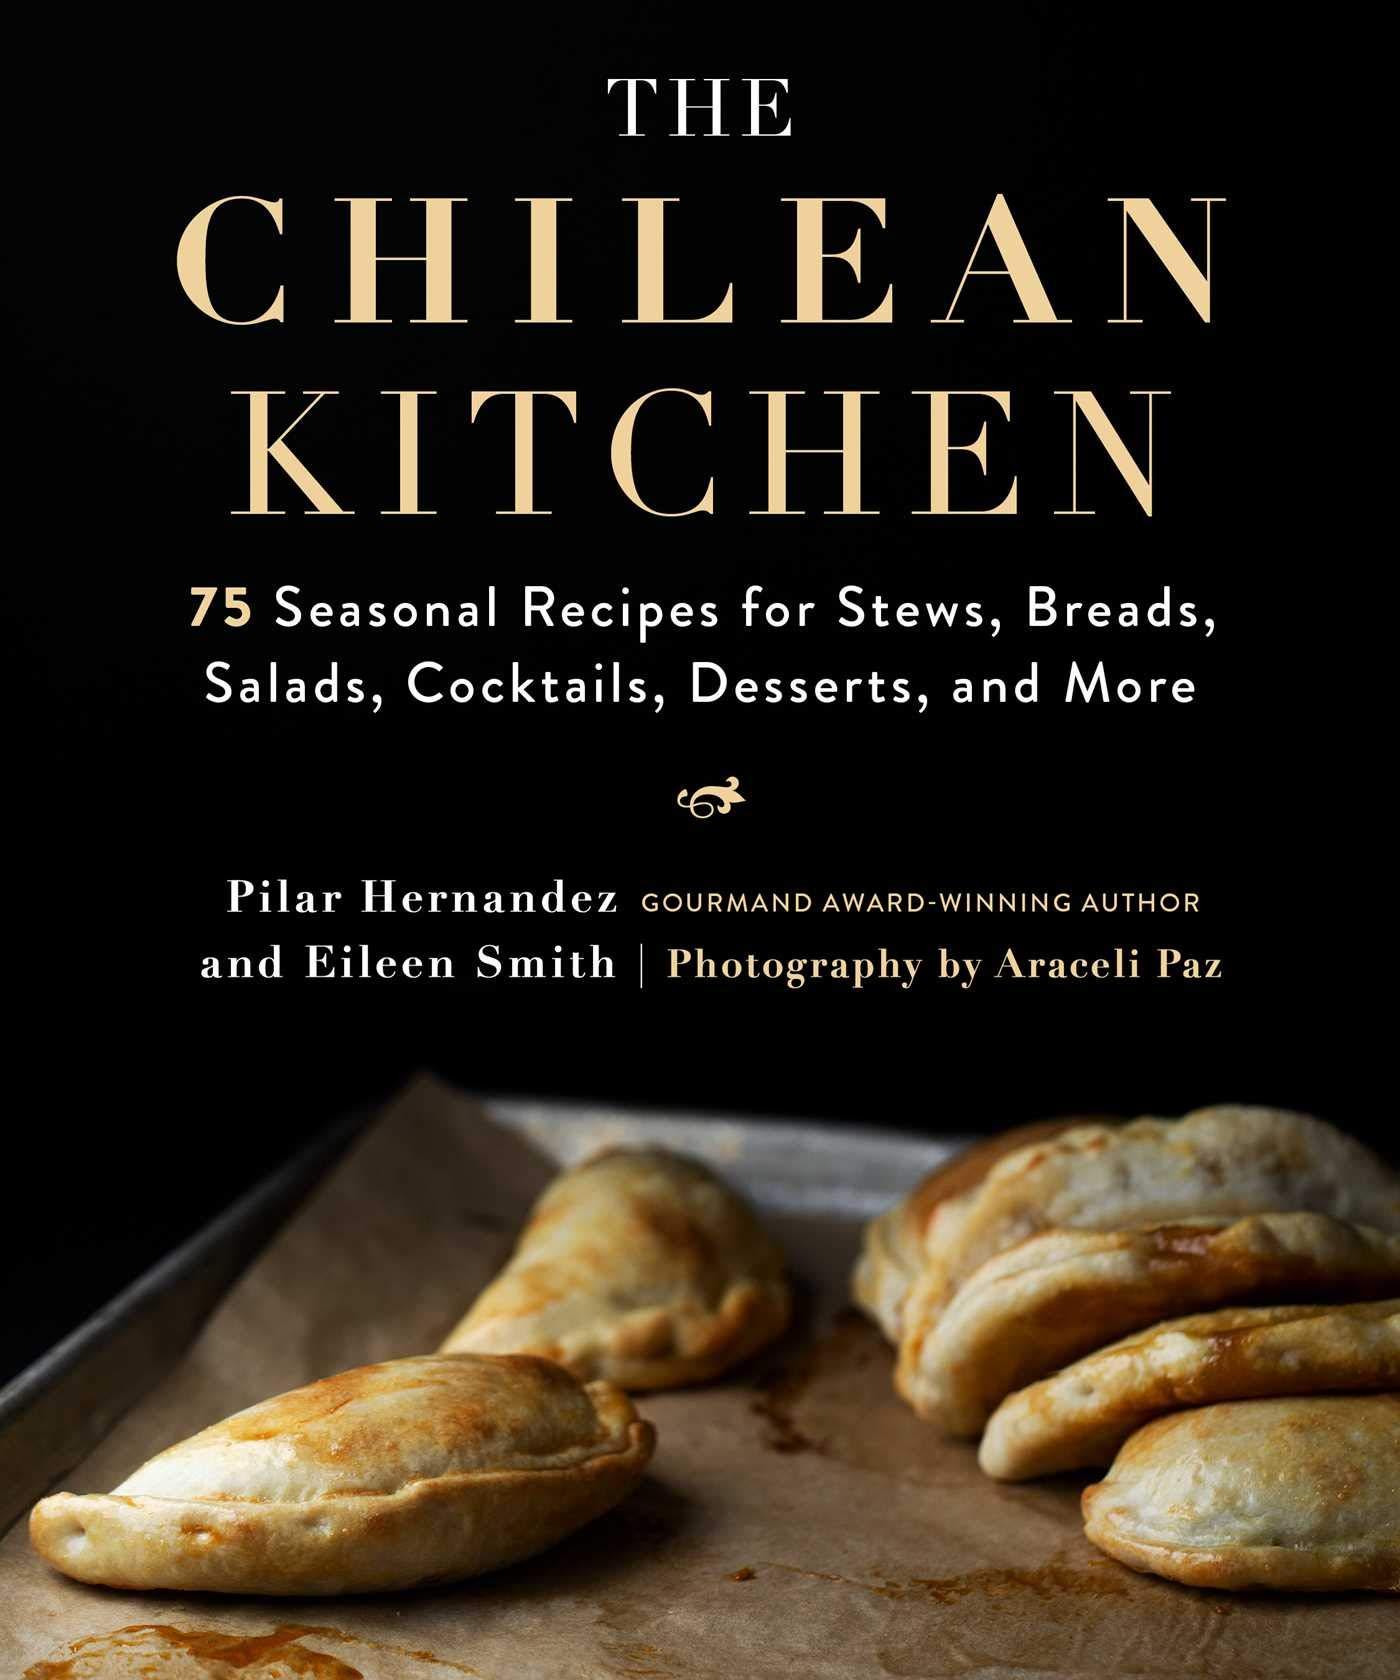 The Chilean Kitchen 75 Seasonal Recipes For Stews Breads Salads Cocktails Desserts And More Hernandez Pilar Smith Eileen Paz Araceli 9781510752856 Amazon Com Books